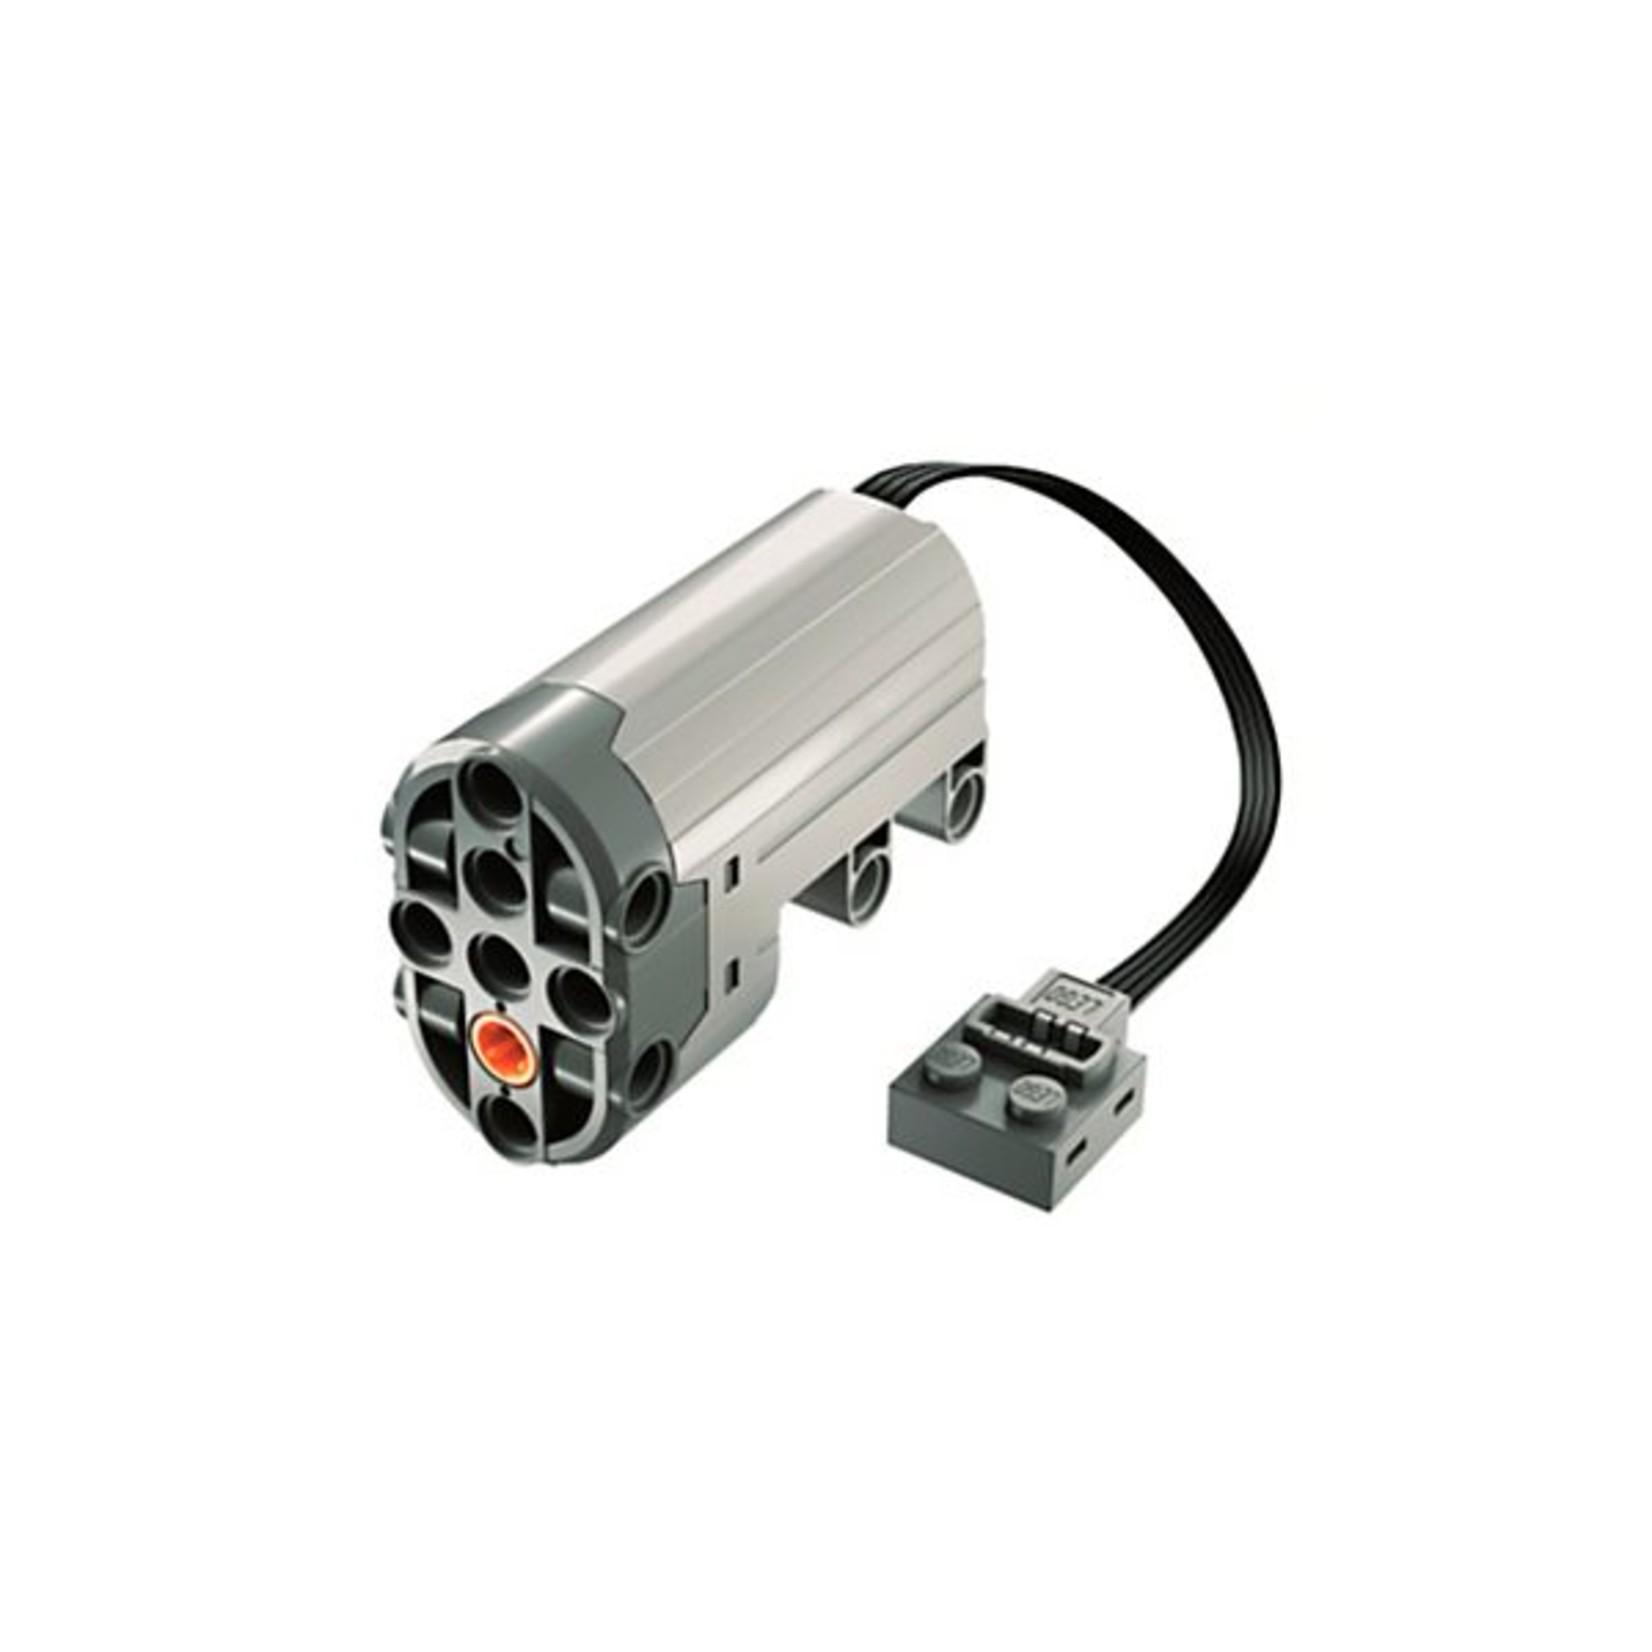 LEGO® Education Power Functions Servo Motor